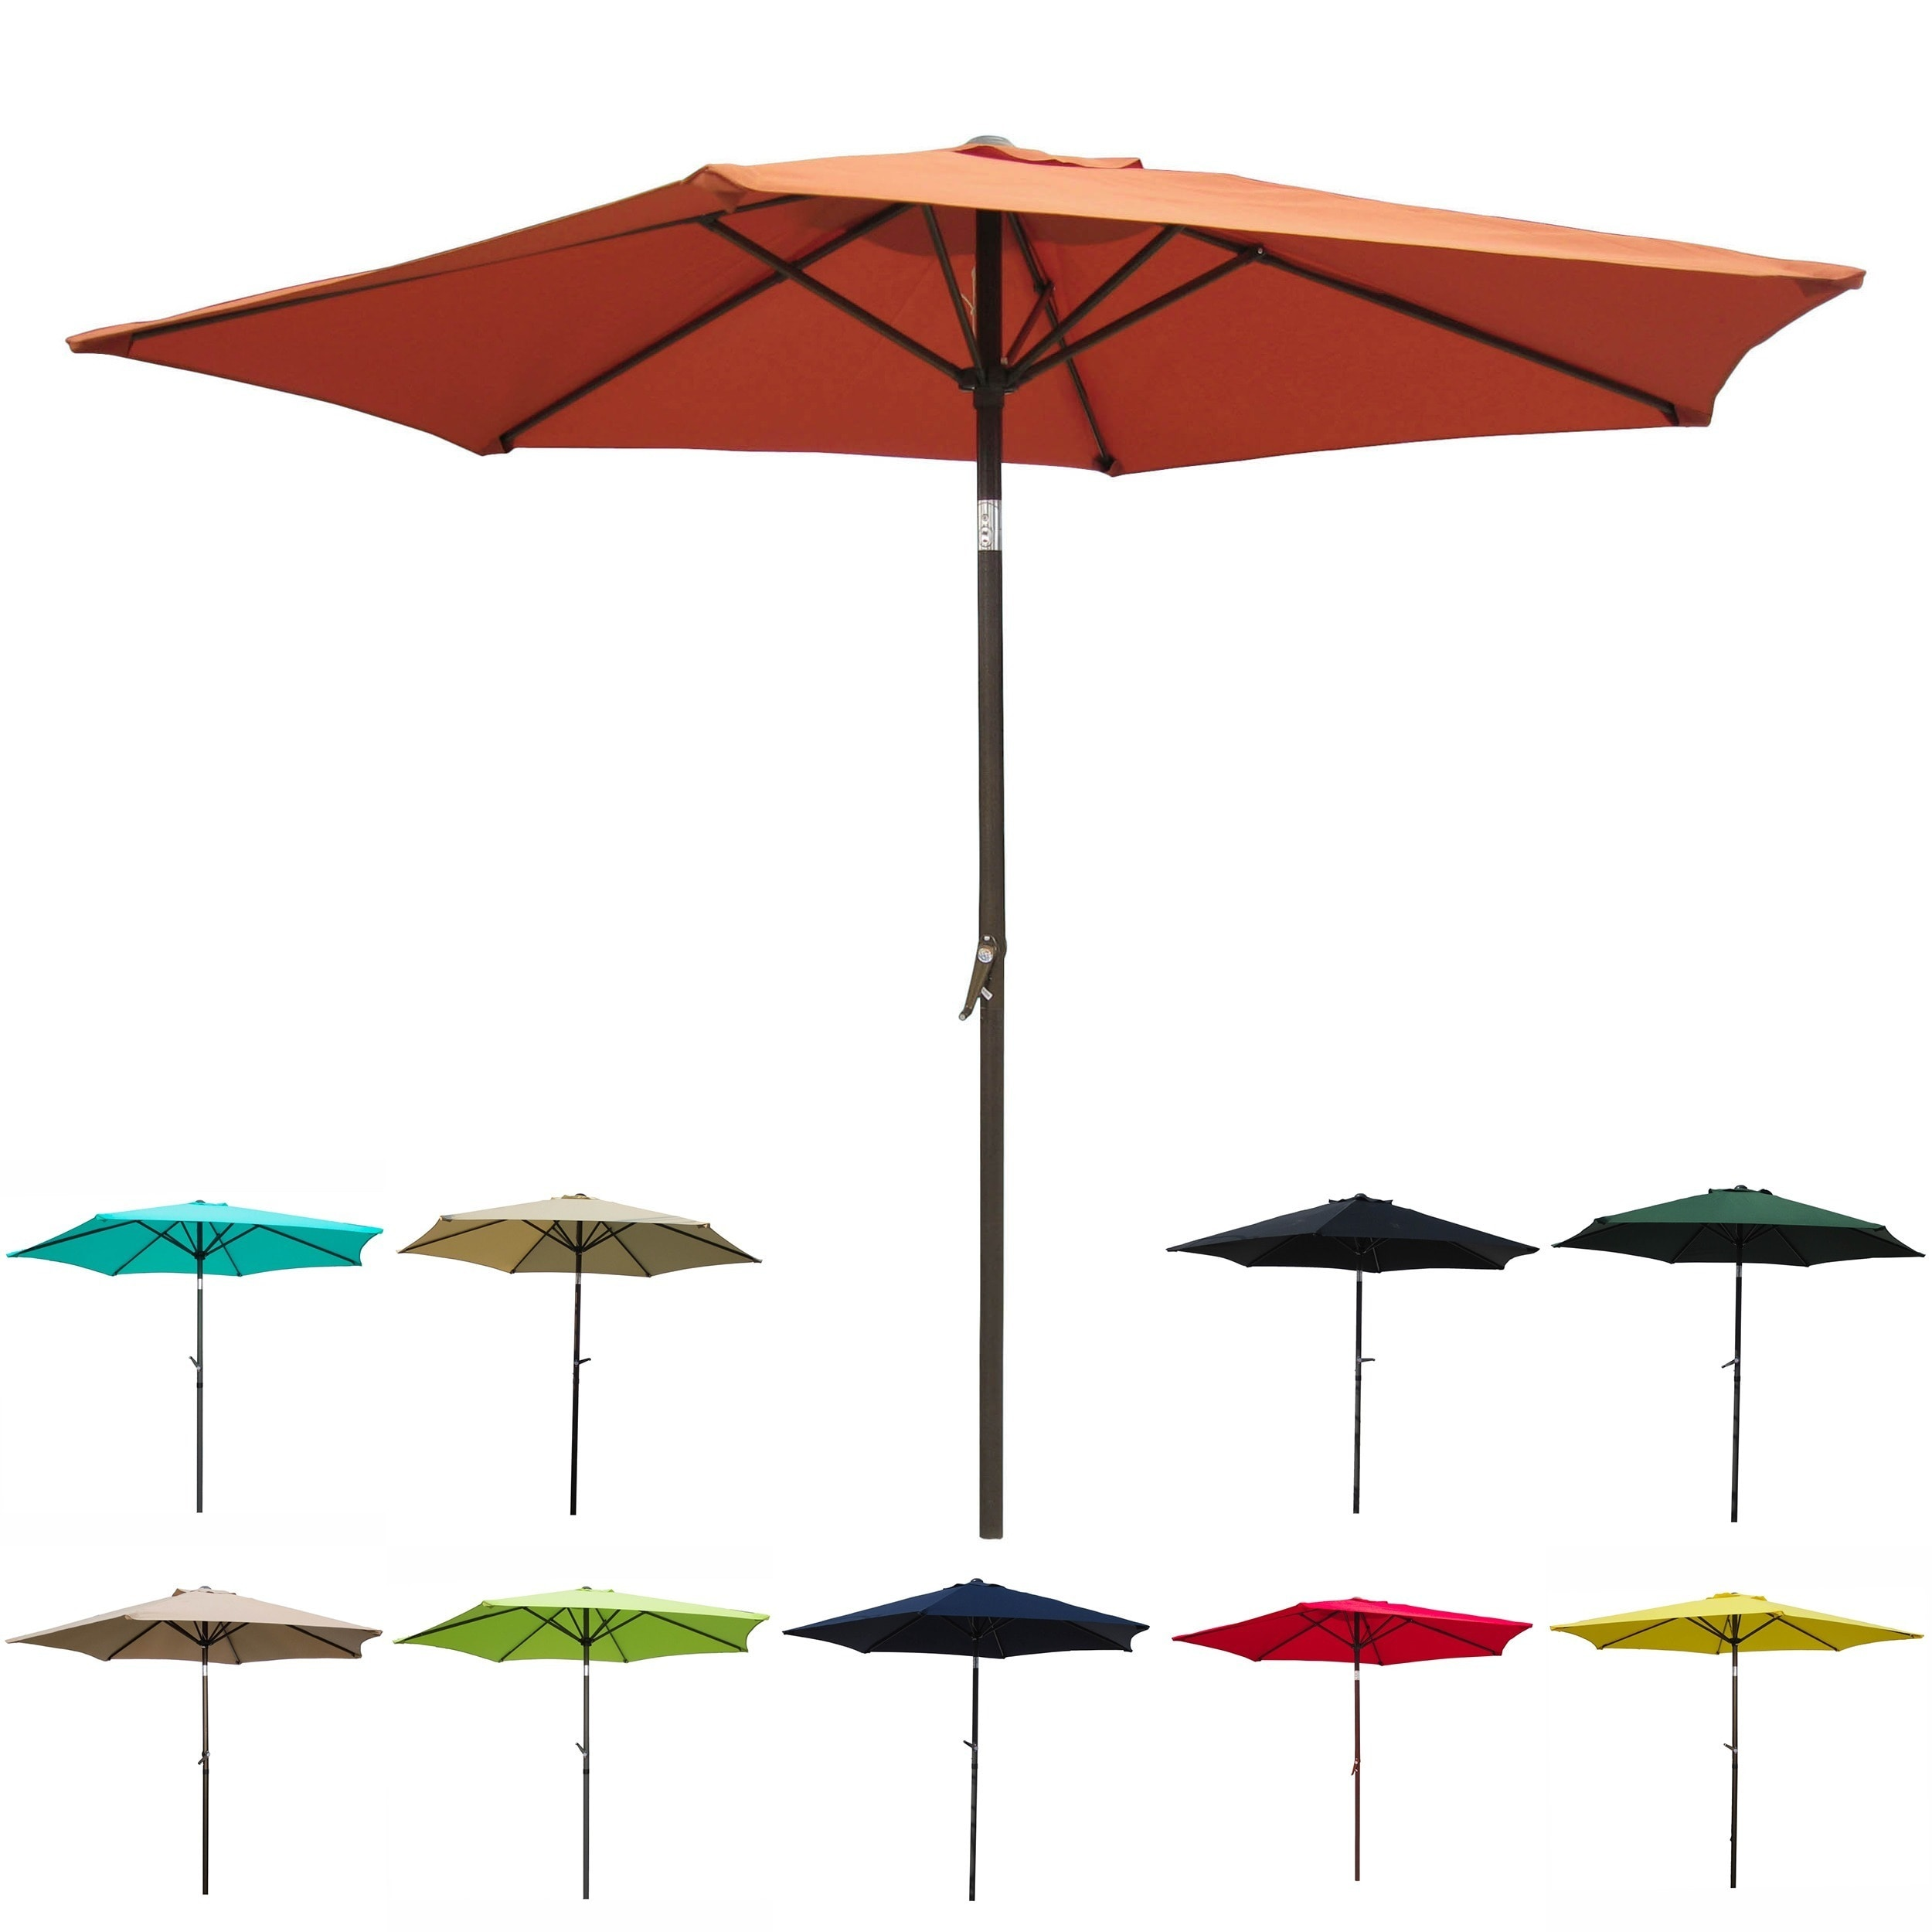 Patio Umbrella 8-foot  sc 1 st  Overstock.com & Patio Umbrellas u0026 Shades | Shop our Best Garden u0026 Patio Deals Online ...